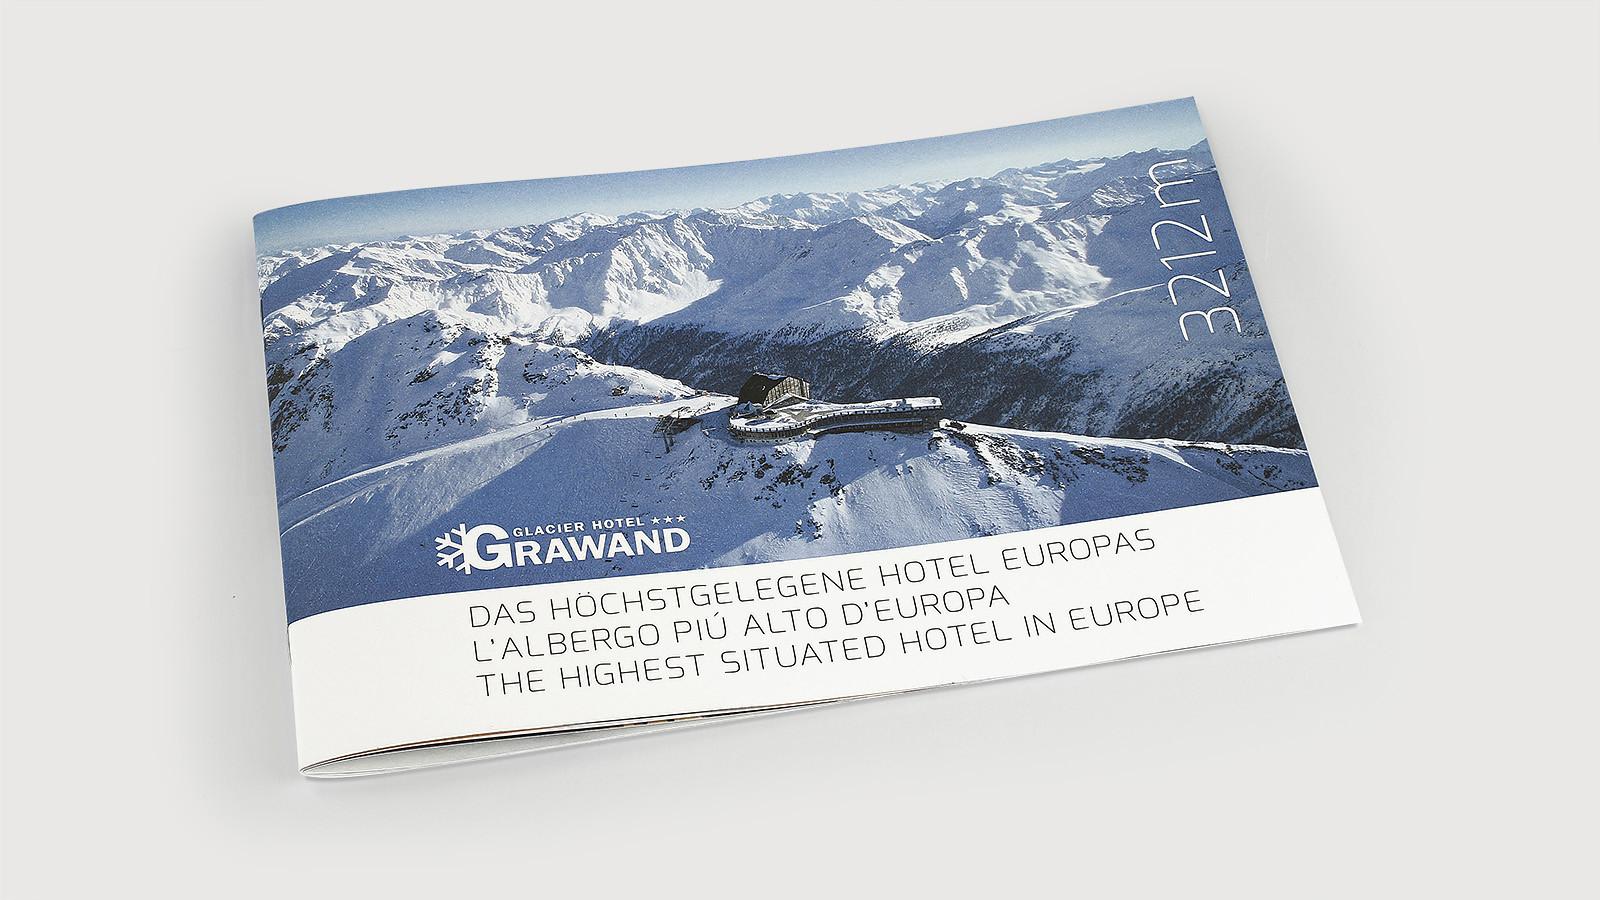 Glacier_Hotel_Grawand